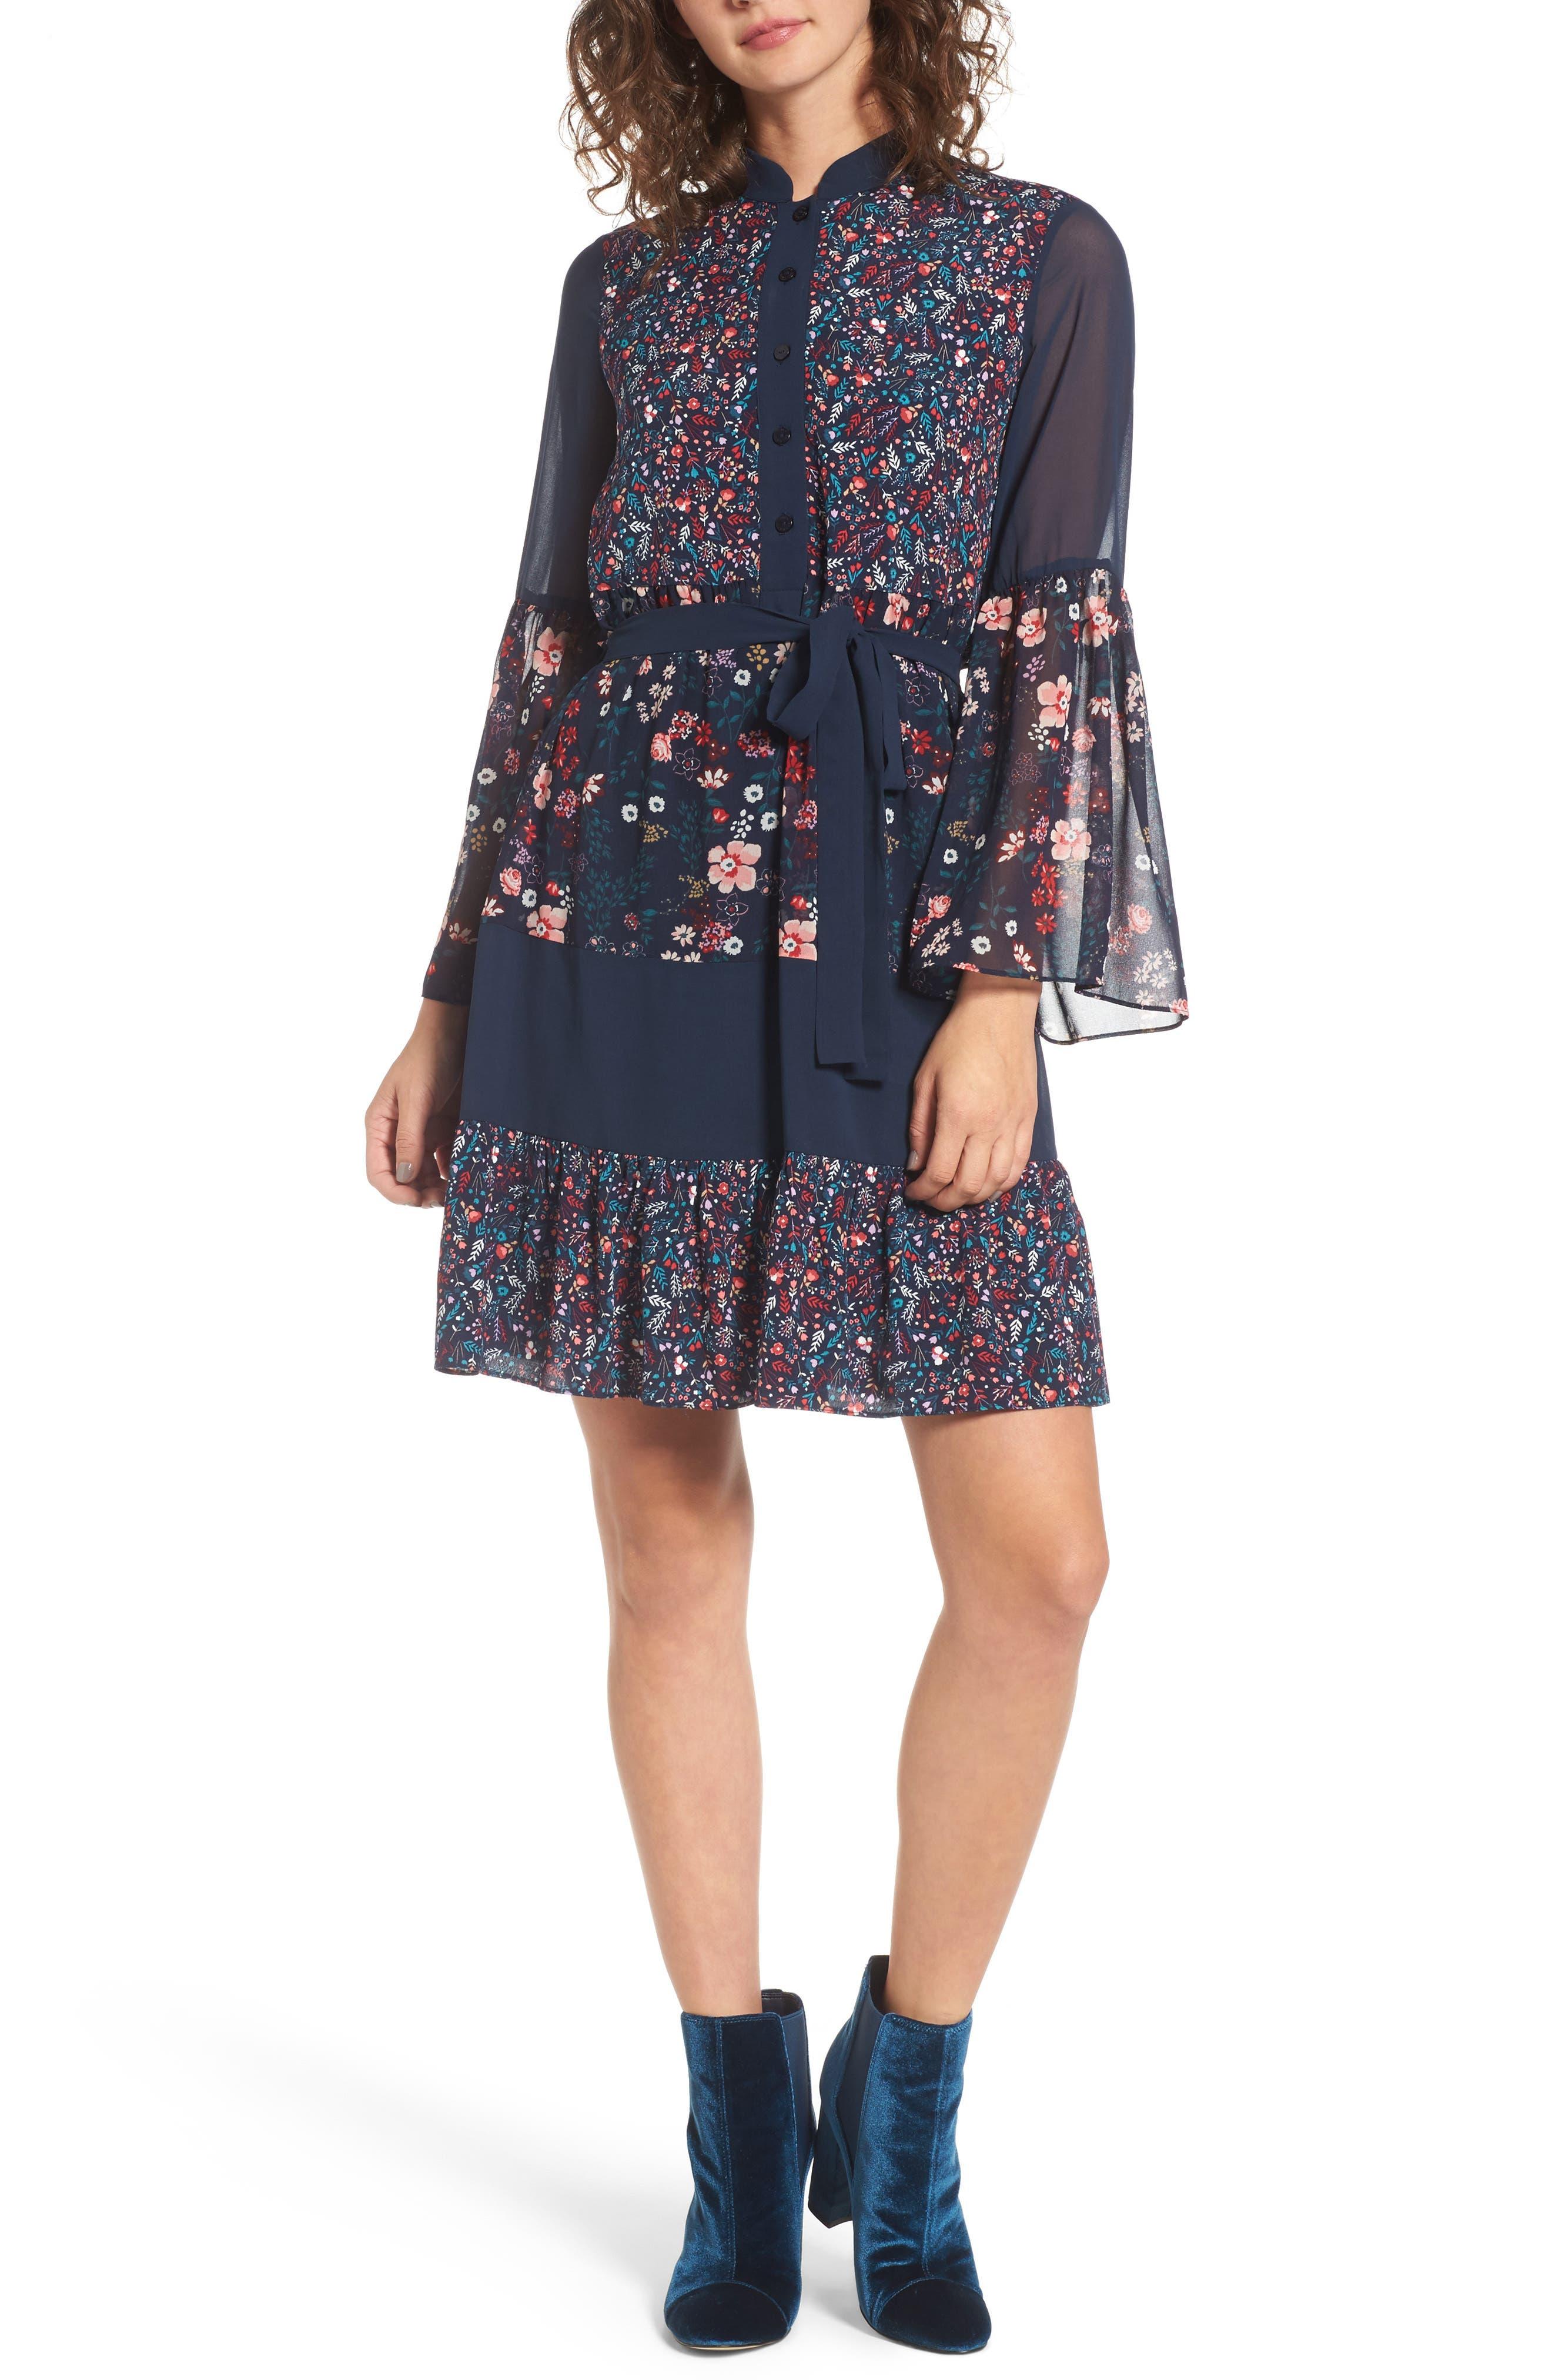 Main Image - Juicy Couture Caprice Floral Mix Shirtdress